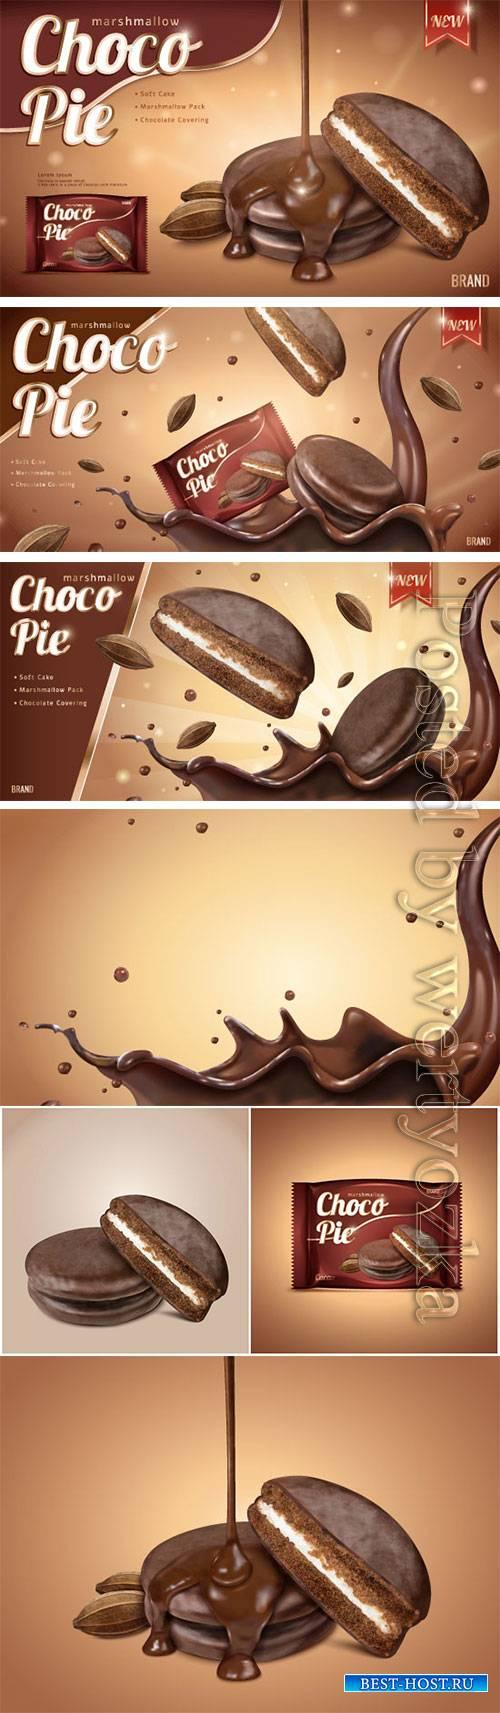 Choco pie ads with splashing syrup